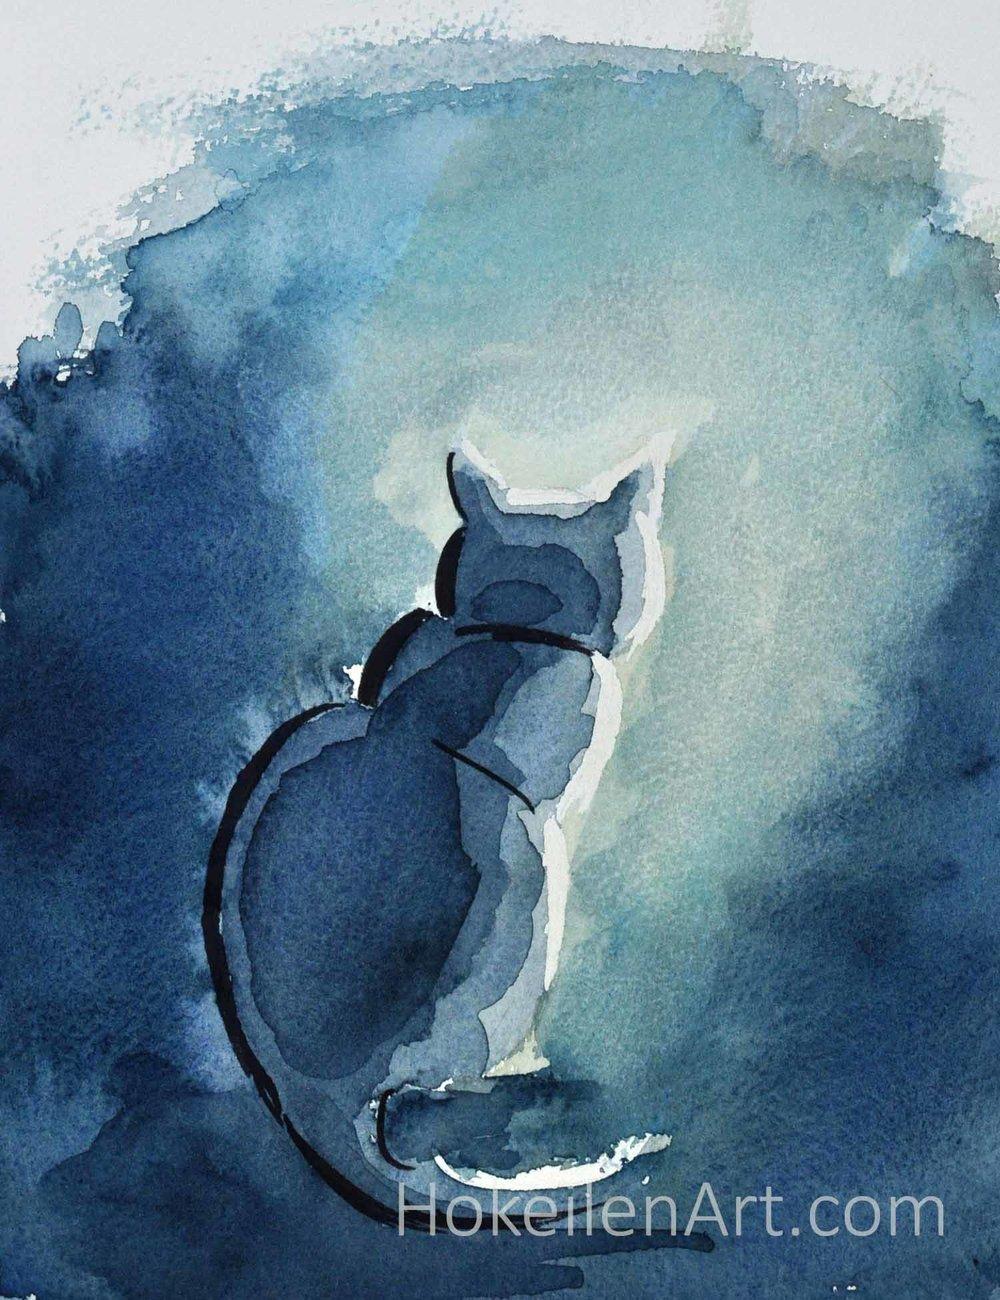 Meditation - watercolor on paper, unframedJune 2018